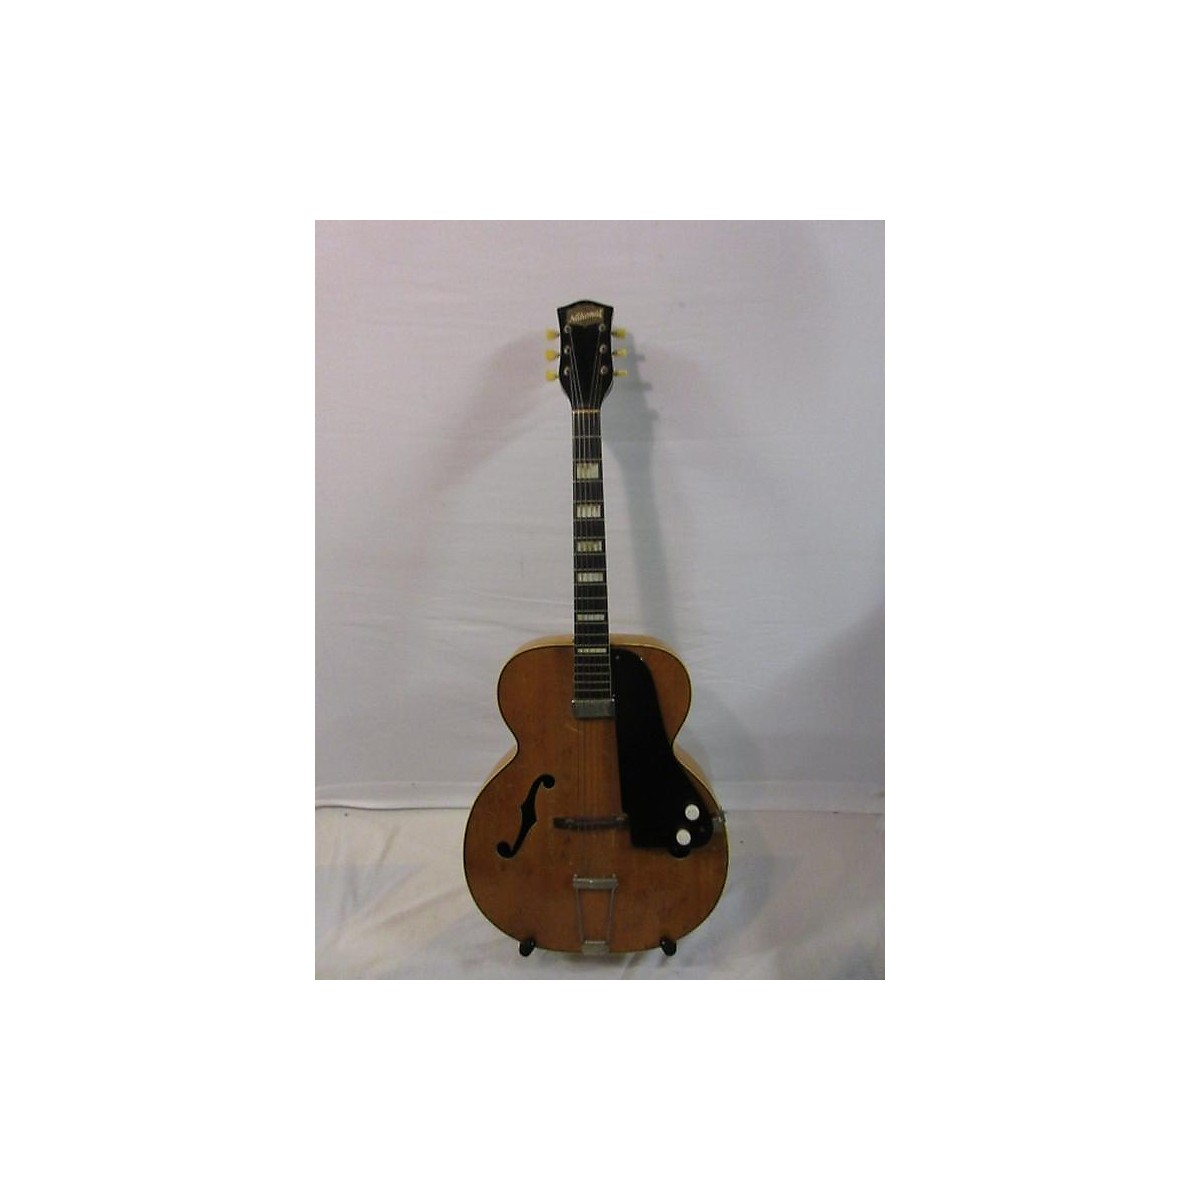 National 1954 1100 CALIFORNIA Hollow Body Electric Guitar